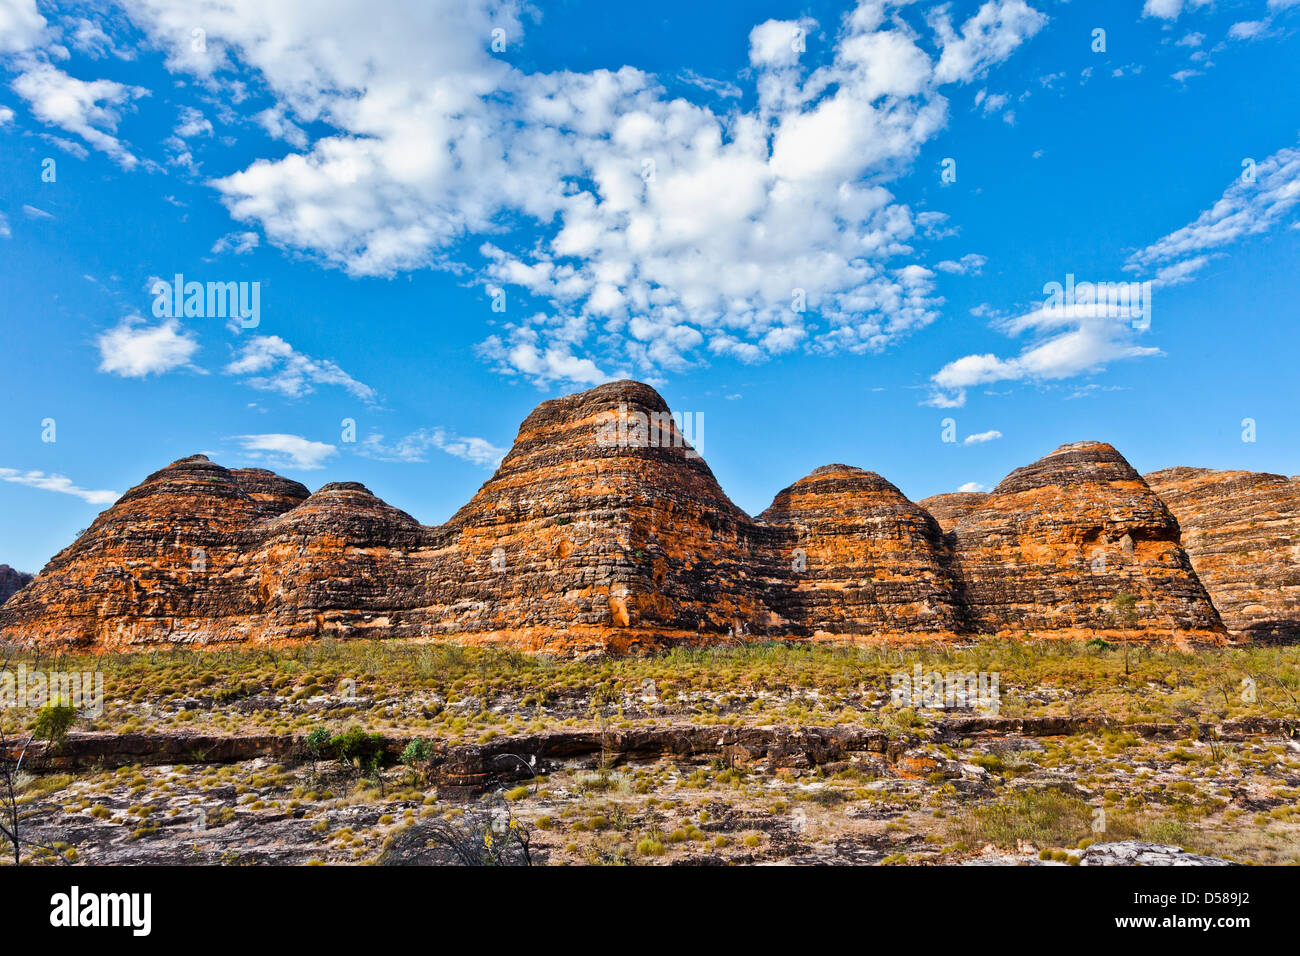 Bungle Bungle Parco Nazionale di Purmululu, vista la caratteristica forma di alveare cupole di arenaria, Australia Immagini Stock